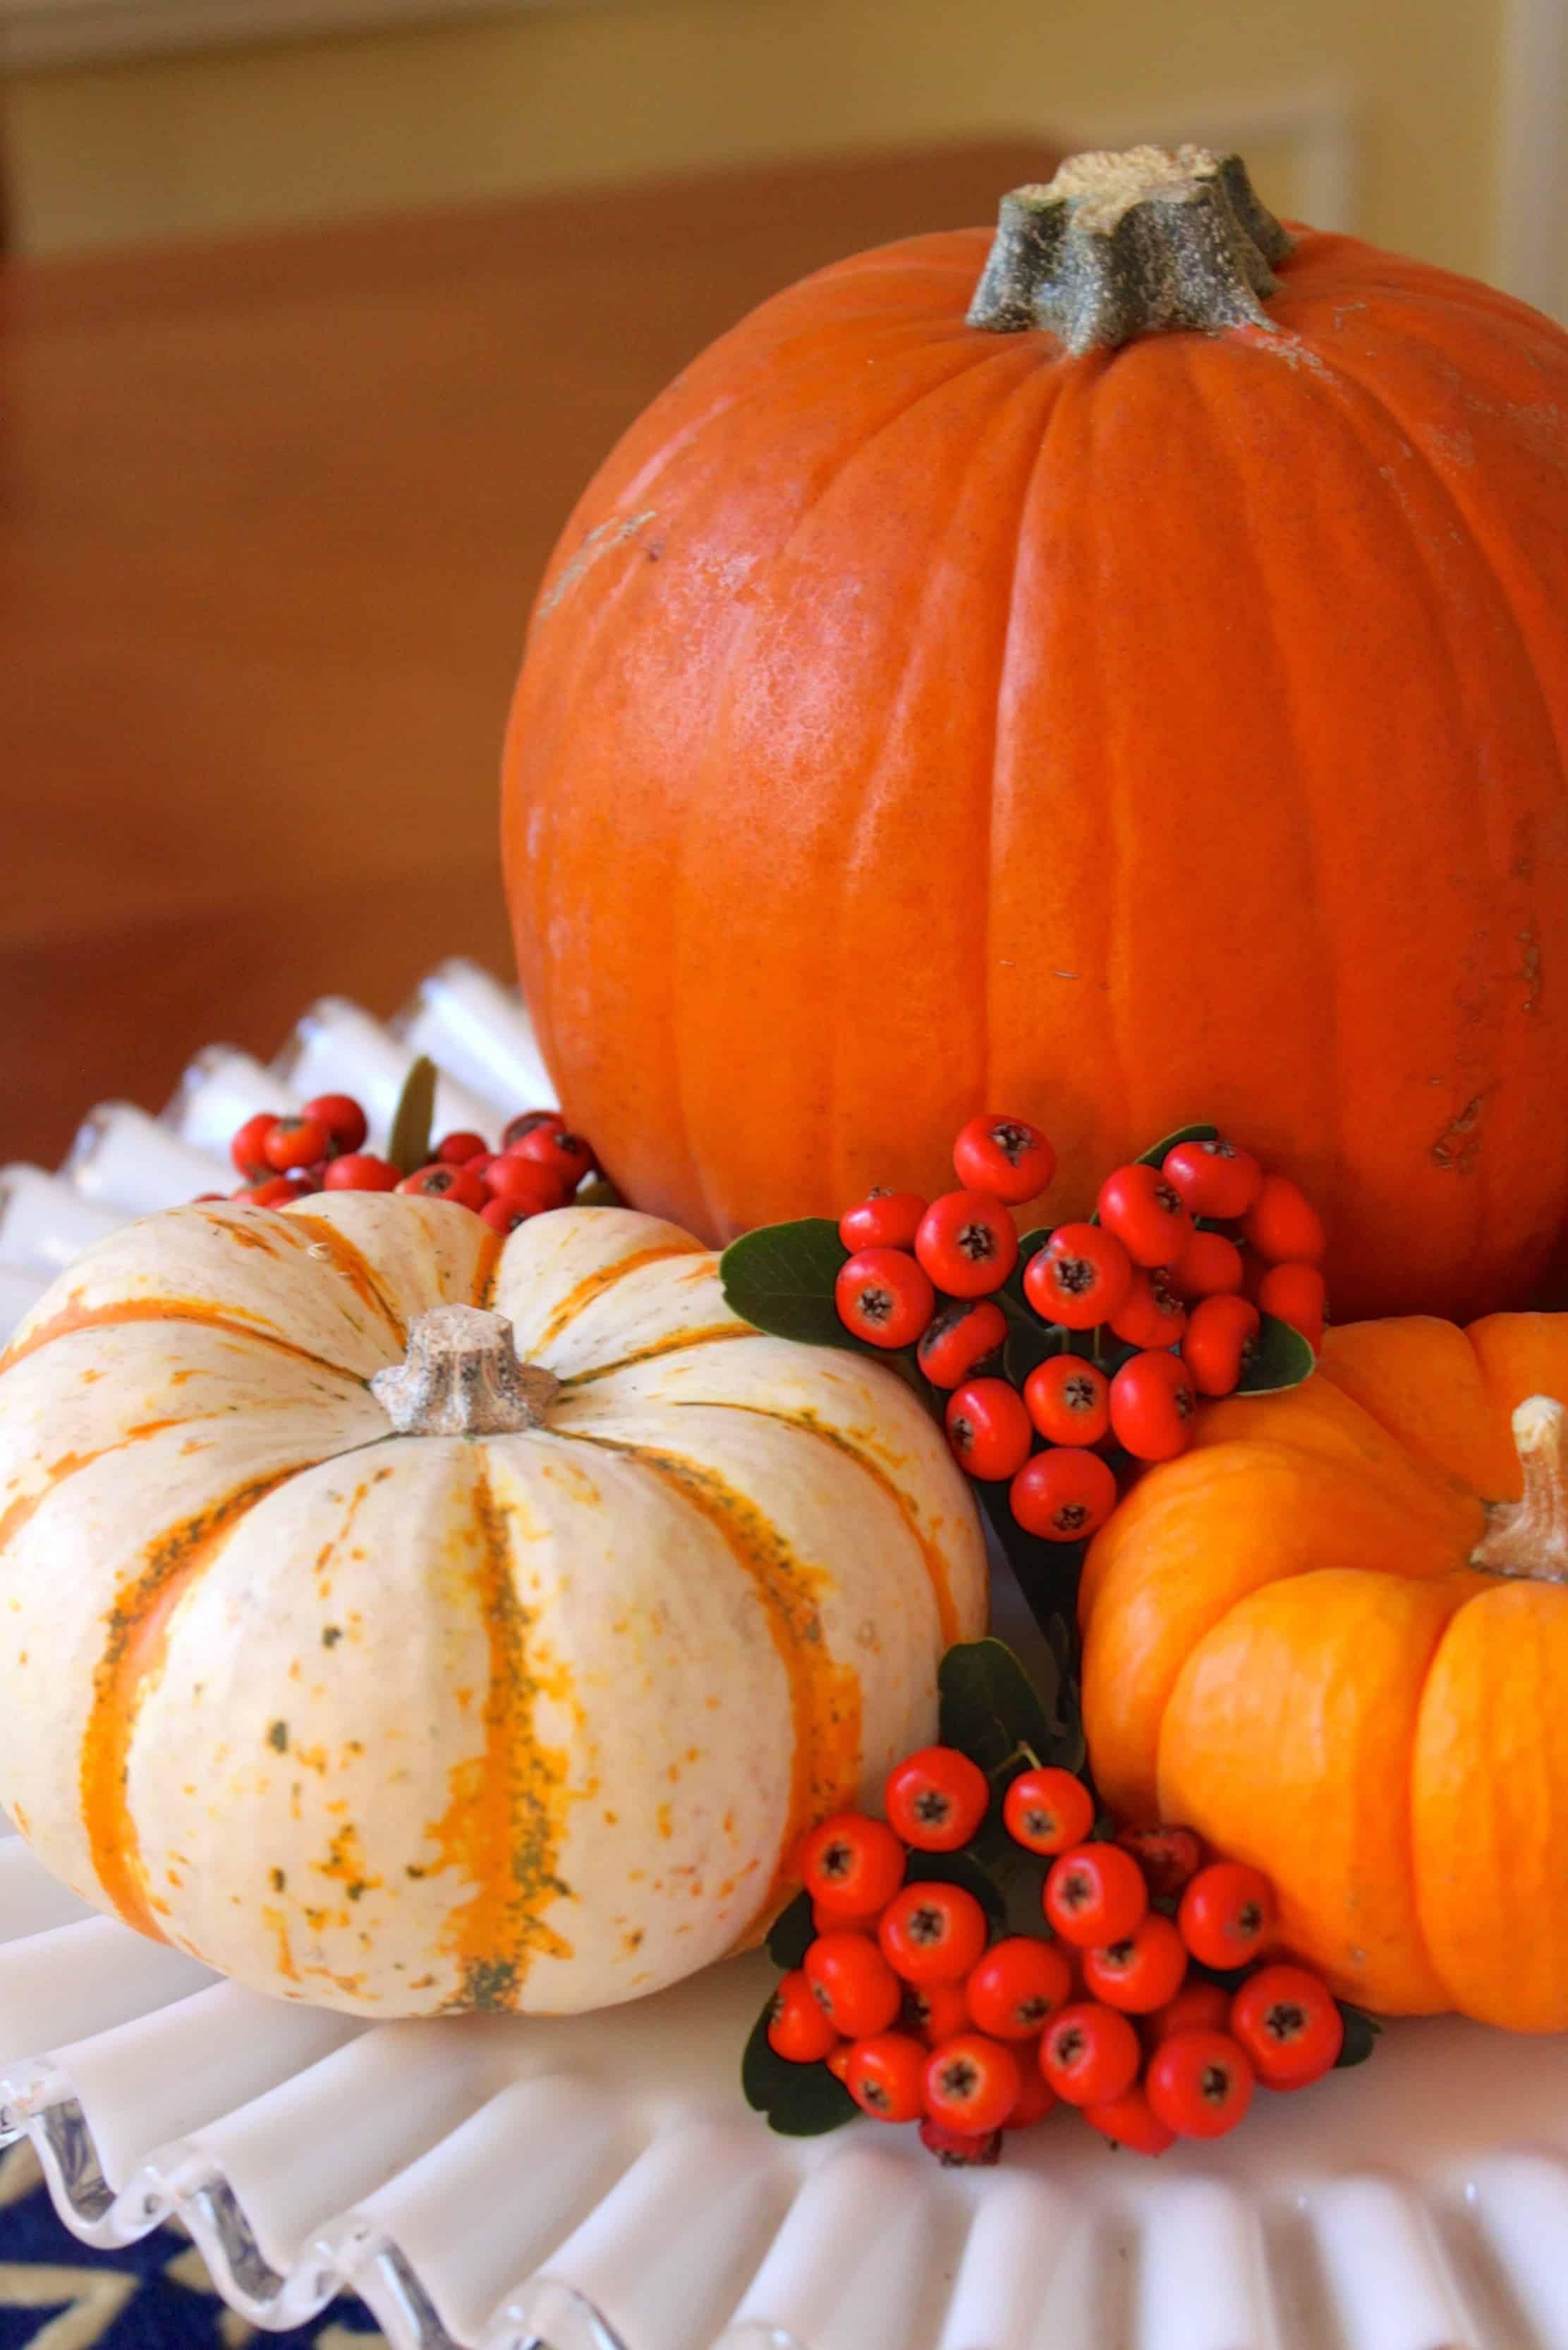 Pretty fall decorative centerpiece with pumpkin